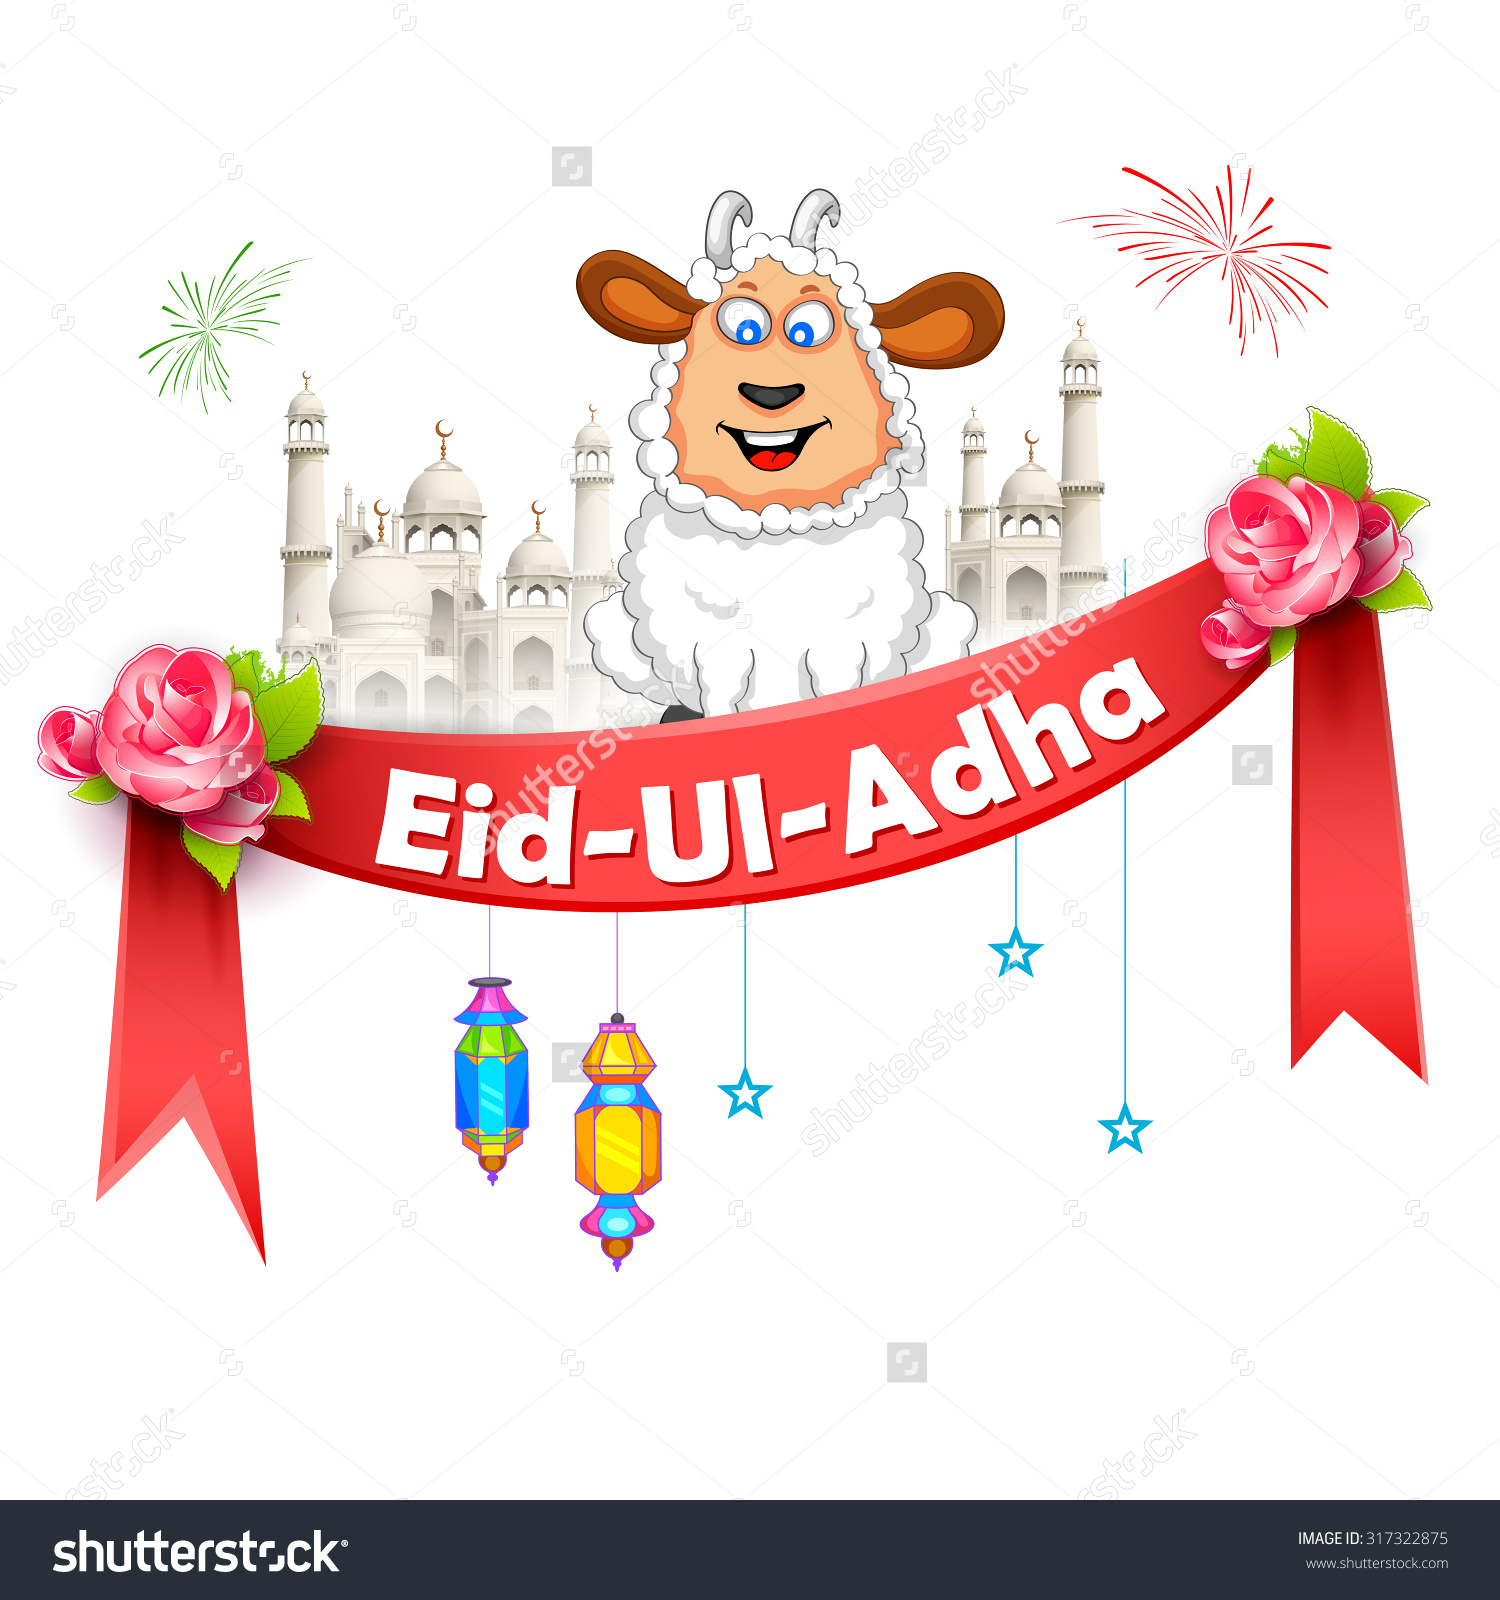 2016 clipart eid ul adha. Beautiful